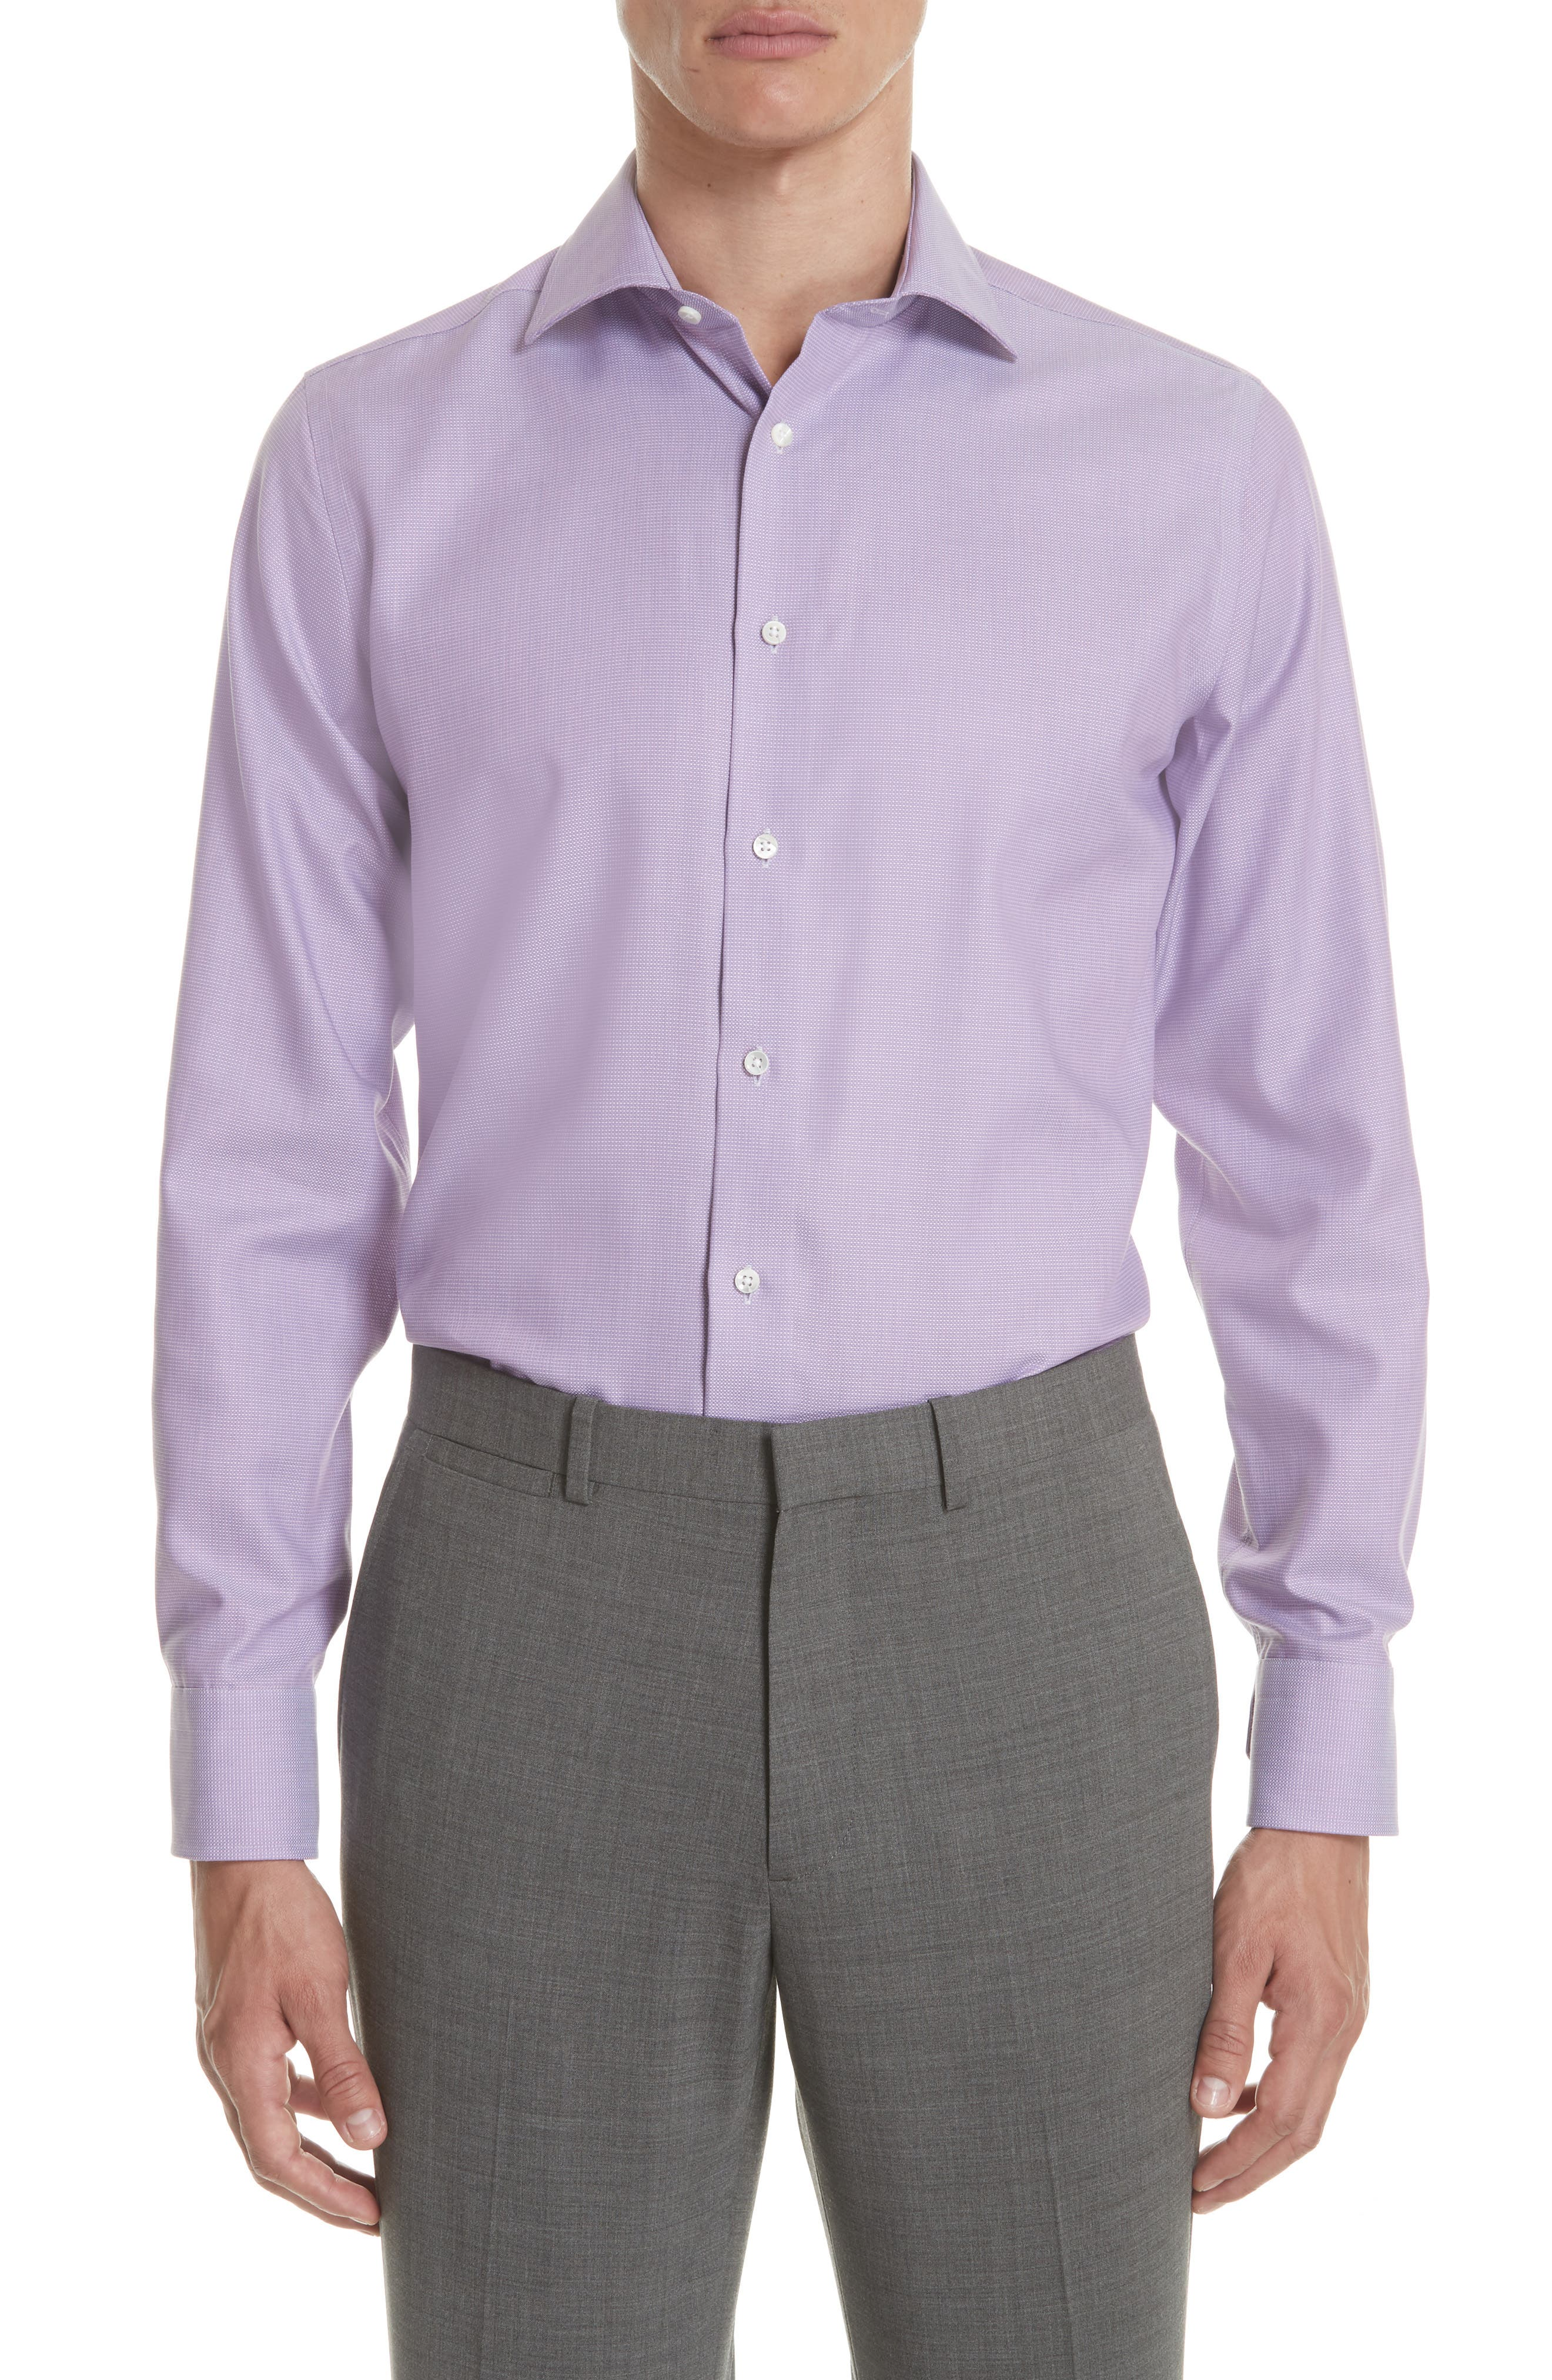 Regular Fit Solid Dress Shirt,                         Main,                         color, 520